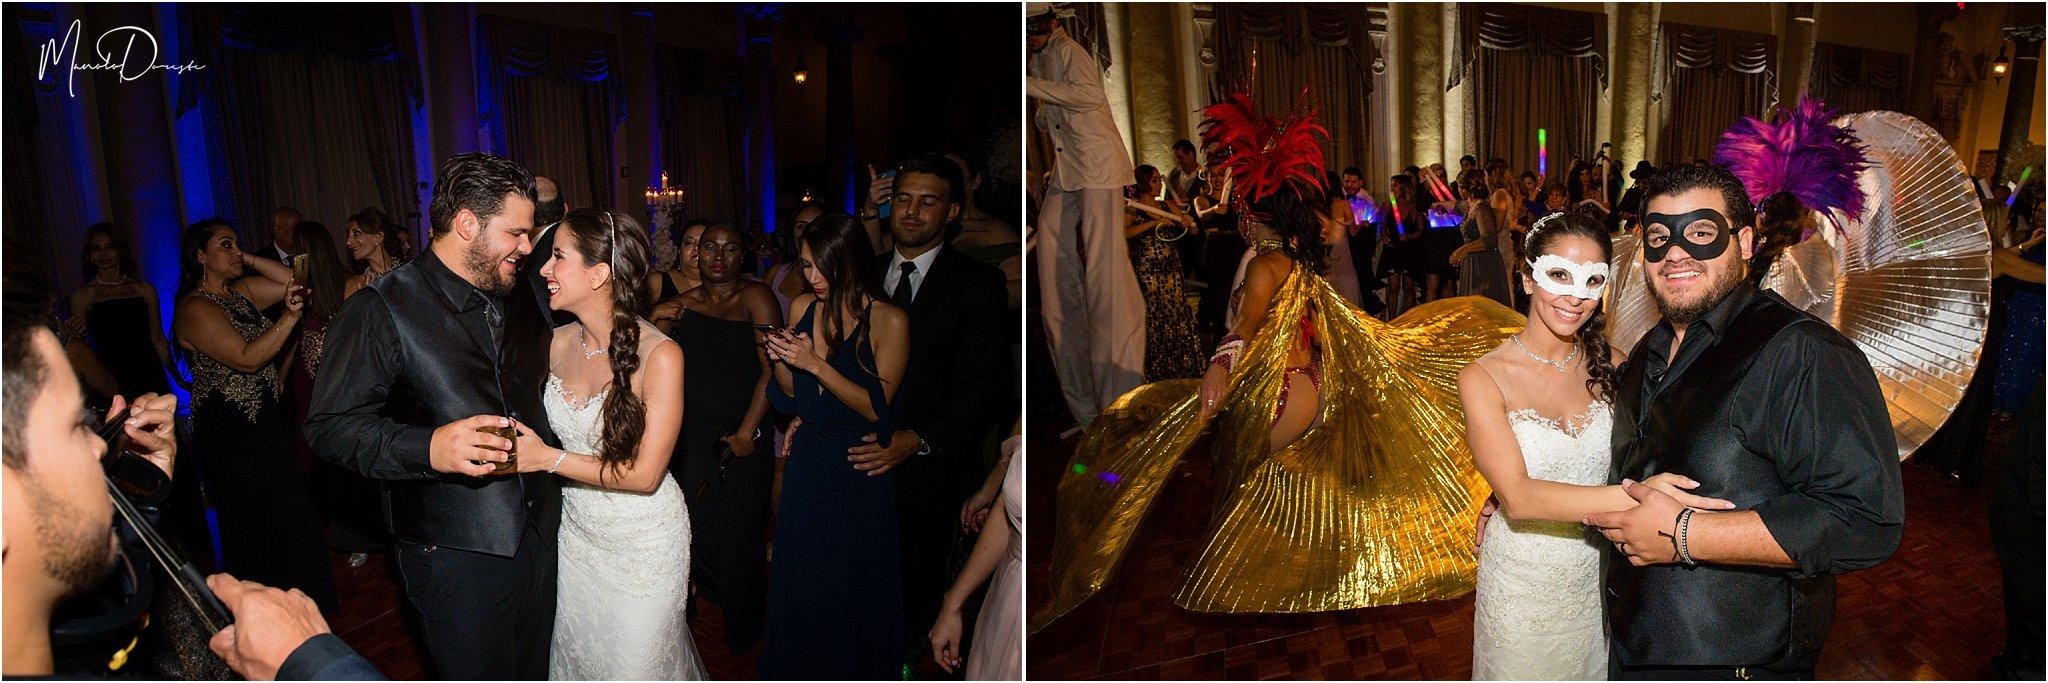 0173_ManoloDoreste_InFocusStudios_Wedding_Family_Photography_Miami_MiamiPhotographer.jpg